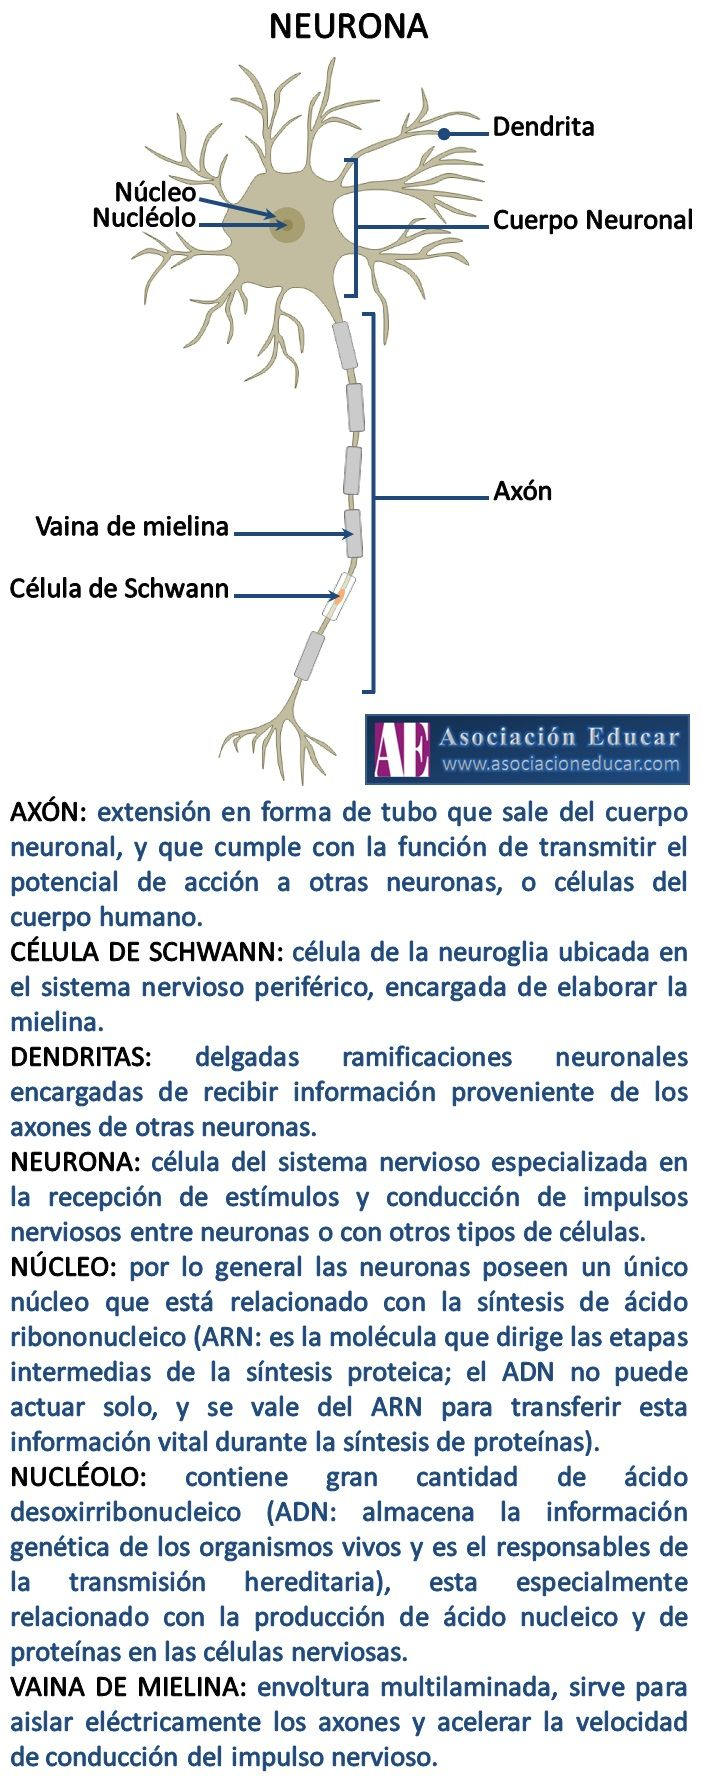 que funcion cumple la vaina de mielina